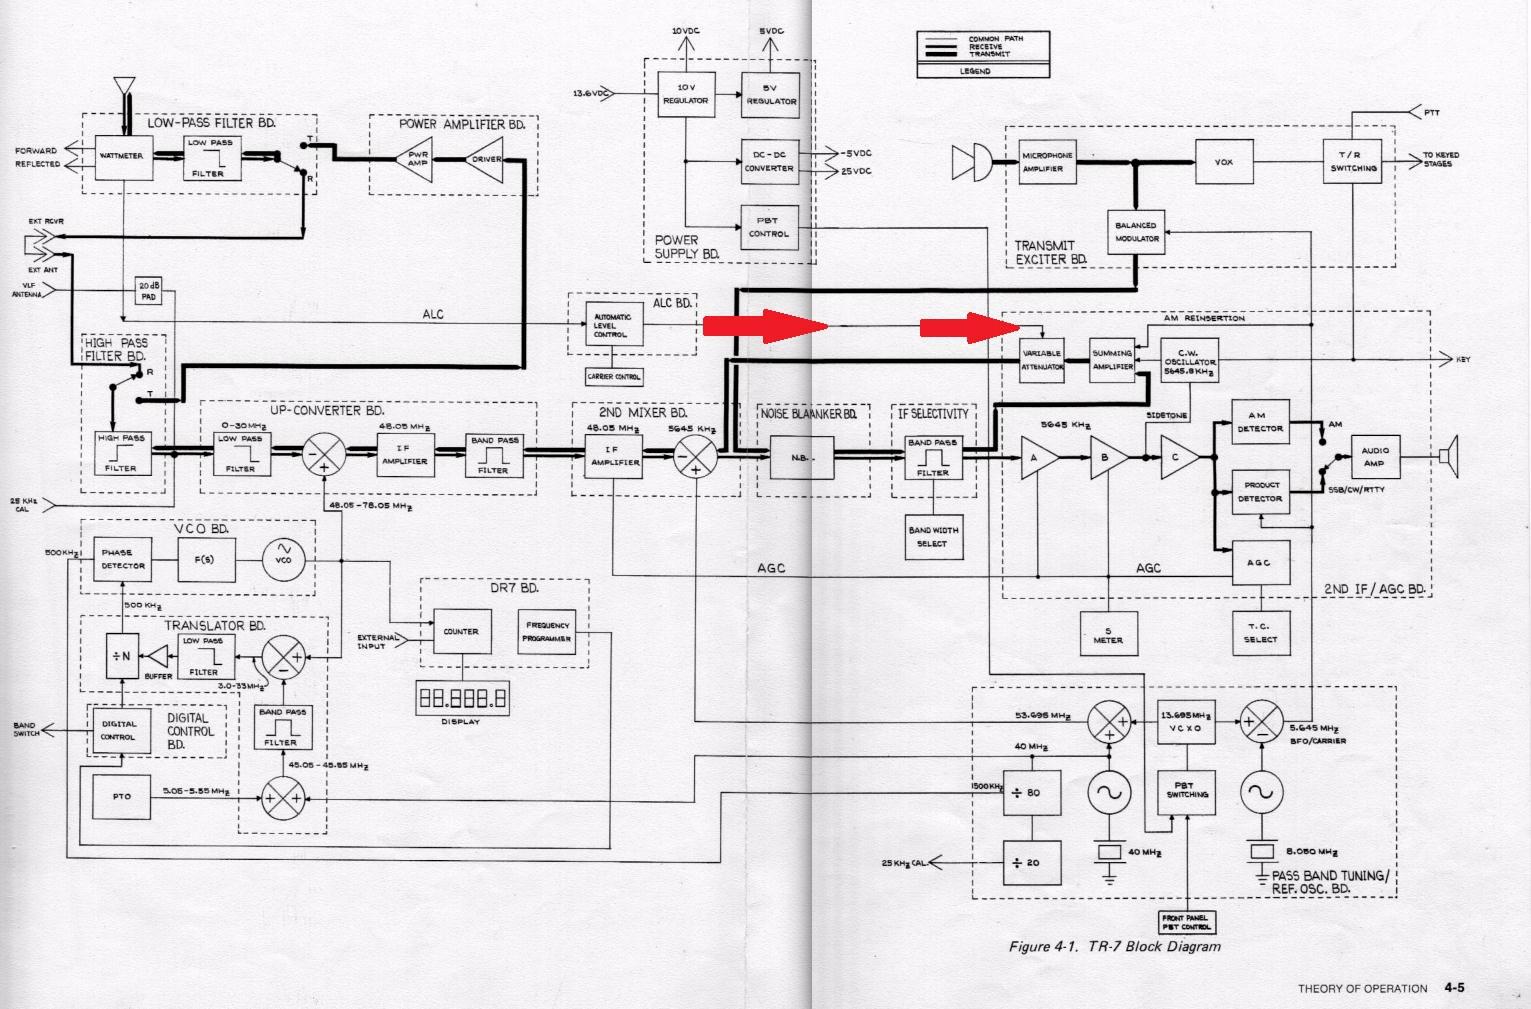 delightful radio wiring diagram for ford ranger html